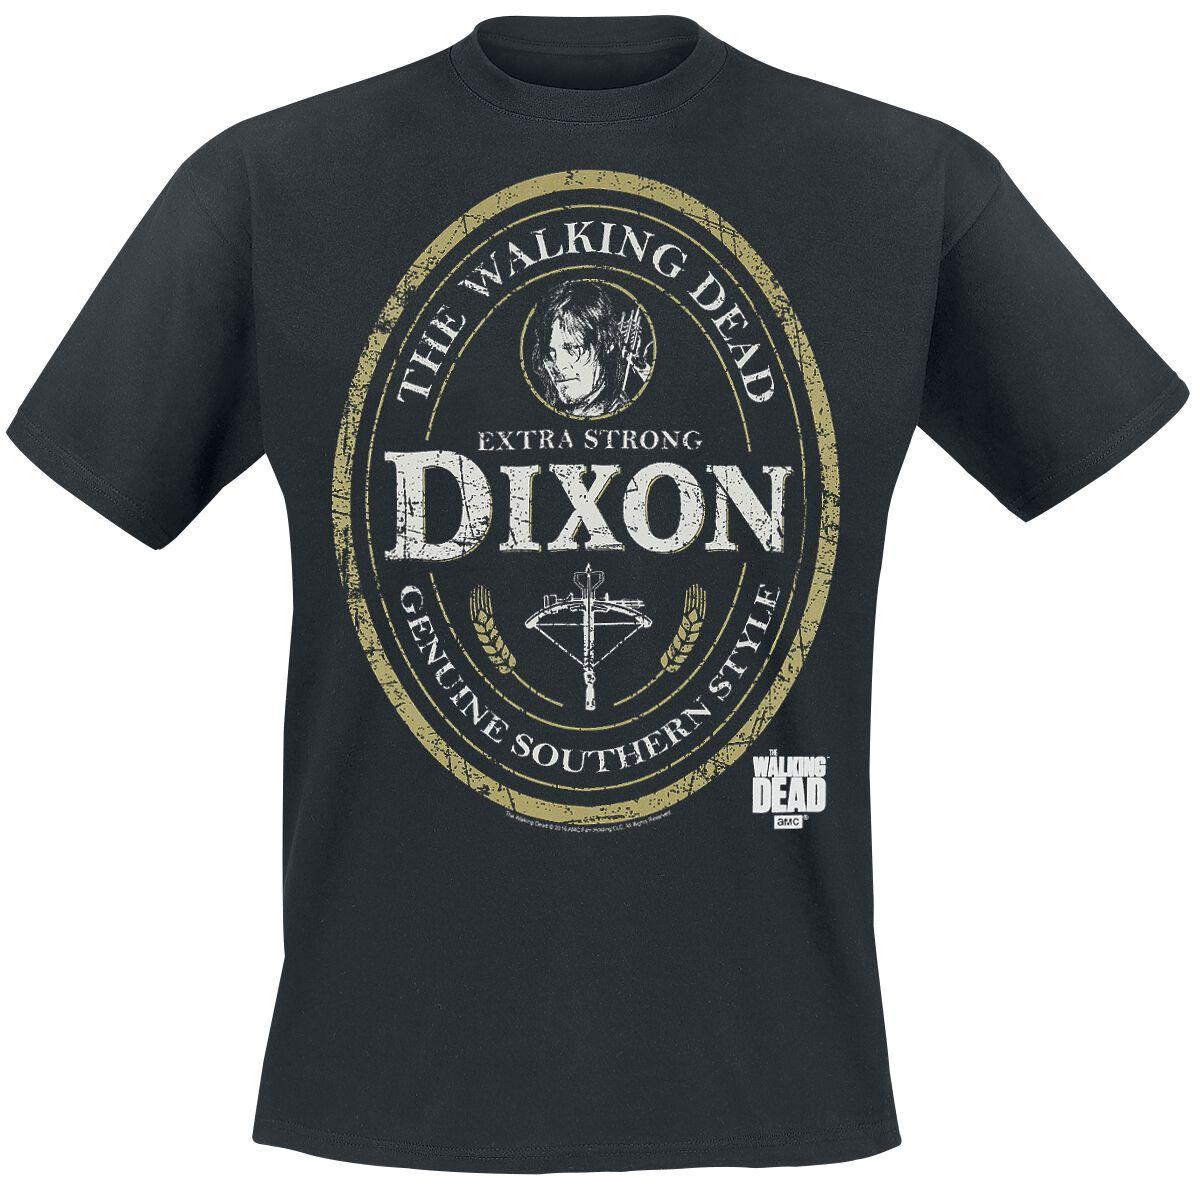 Image of   The Walking Dead Daryl Dixon Label T-Shirt sort